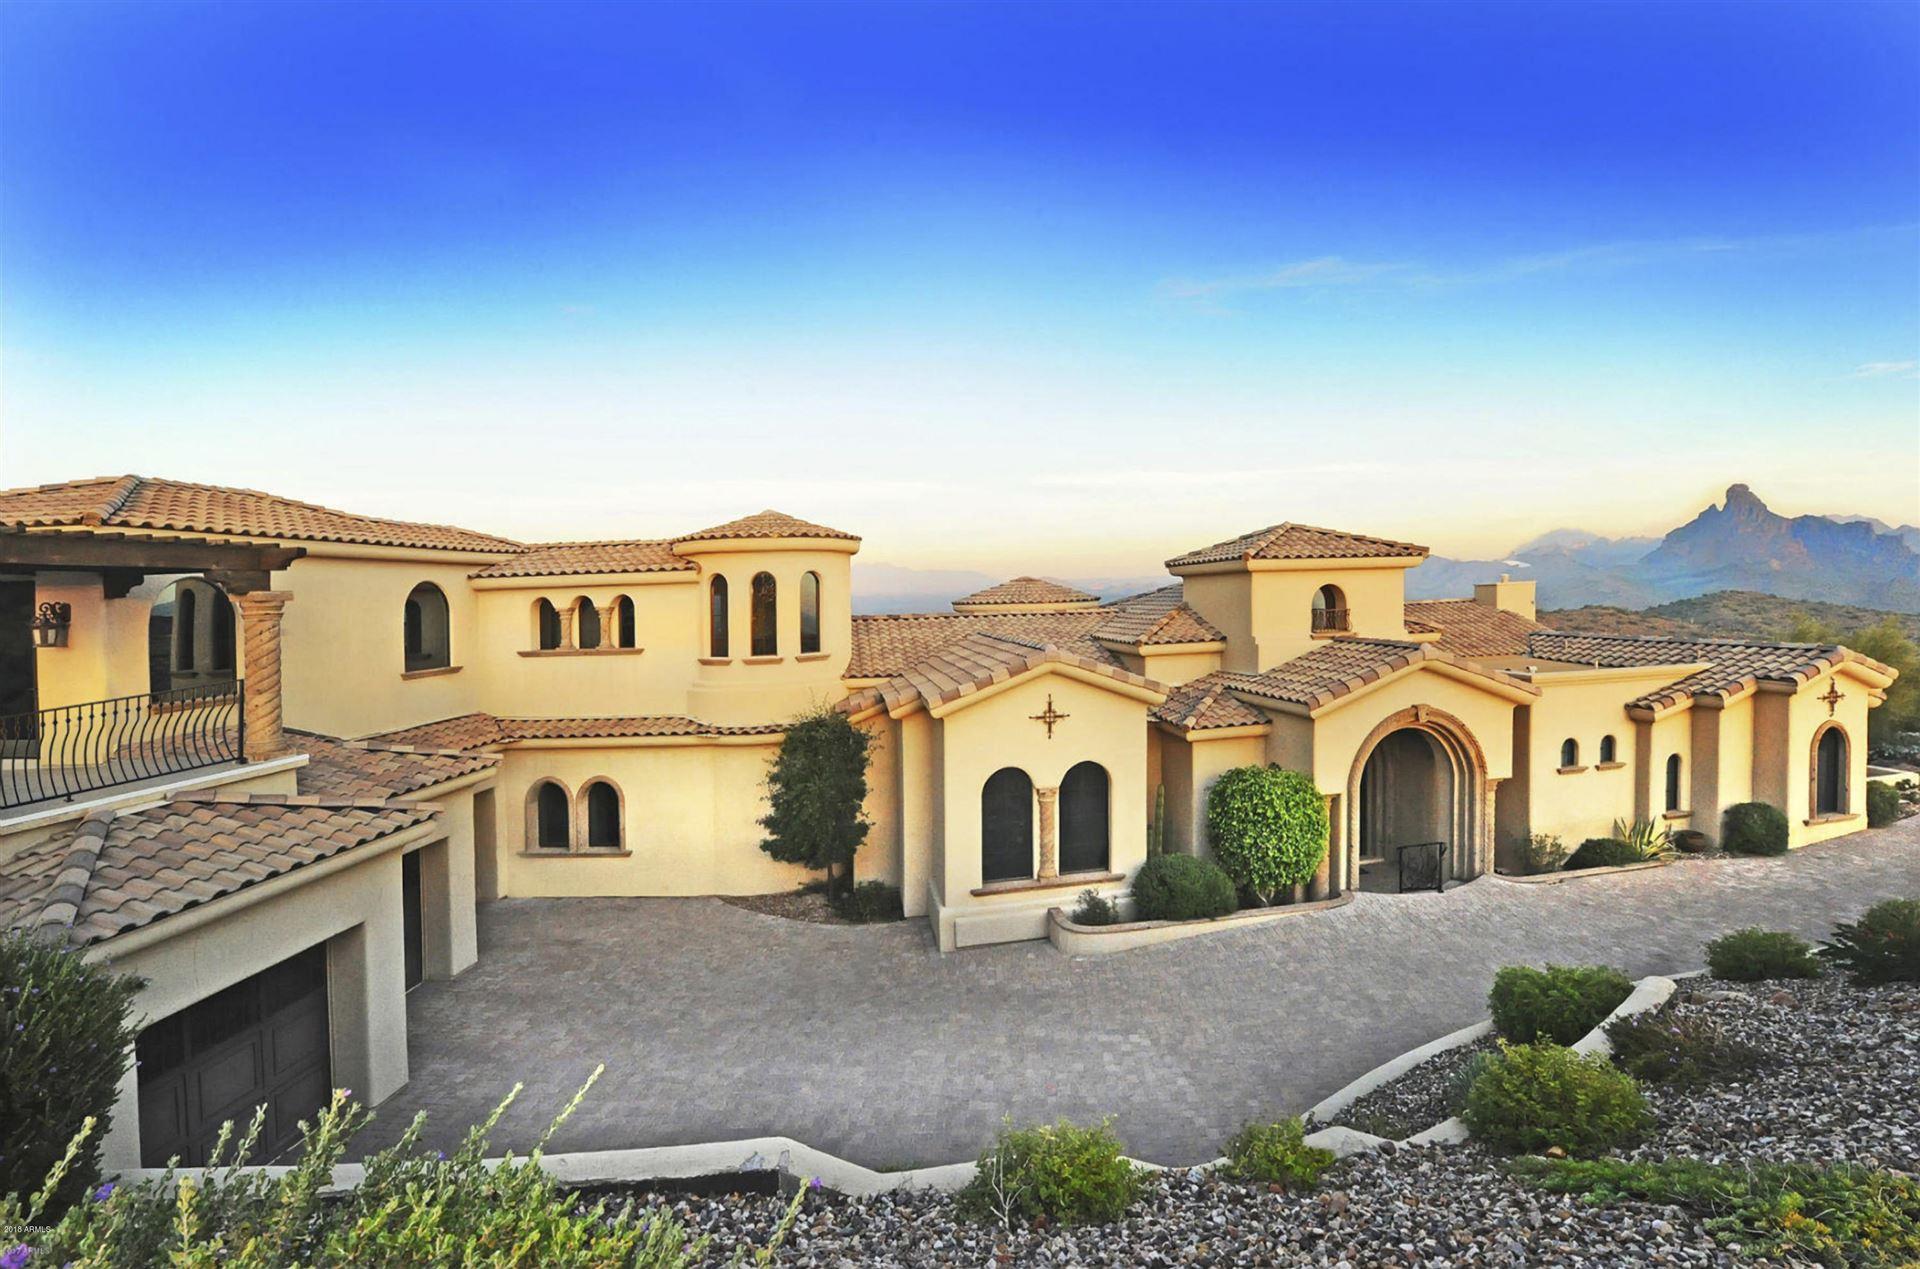 9127 N VISTA VERDE Court, Fountain Hills, AZ 85268 - MLS#: 6128872